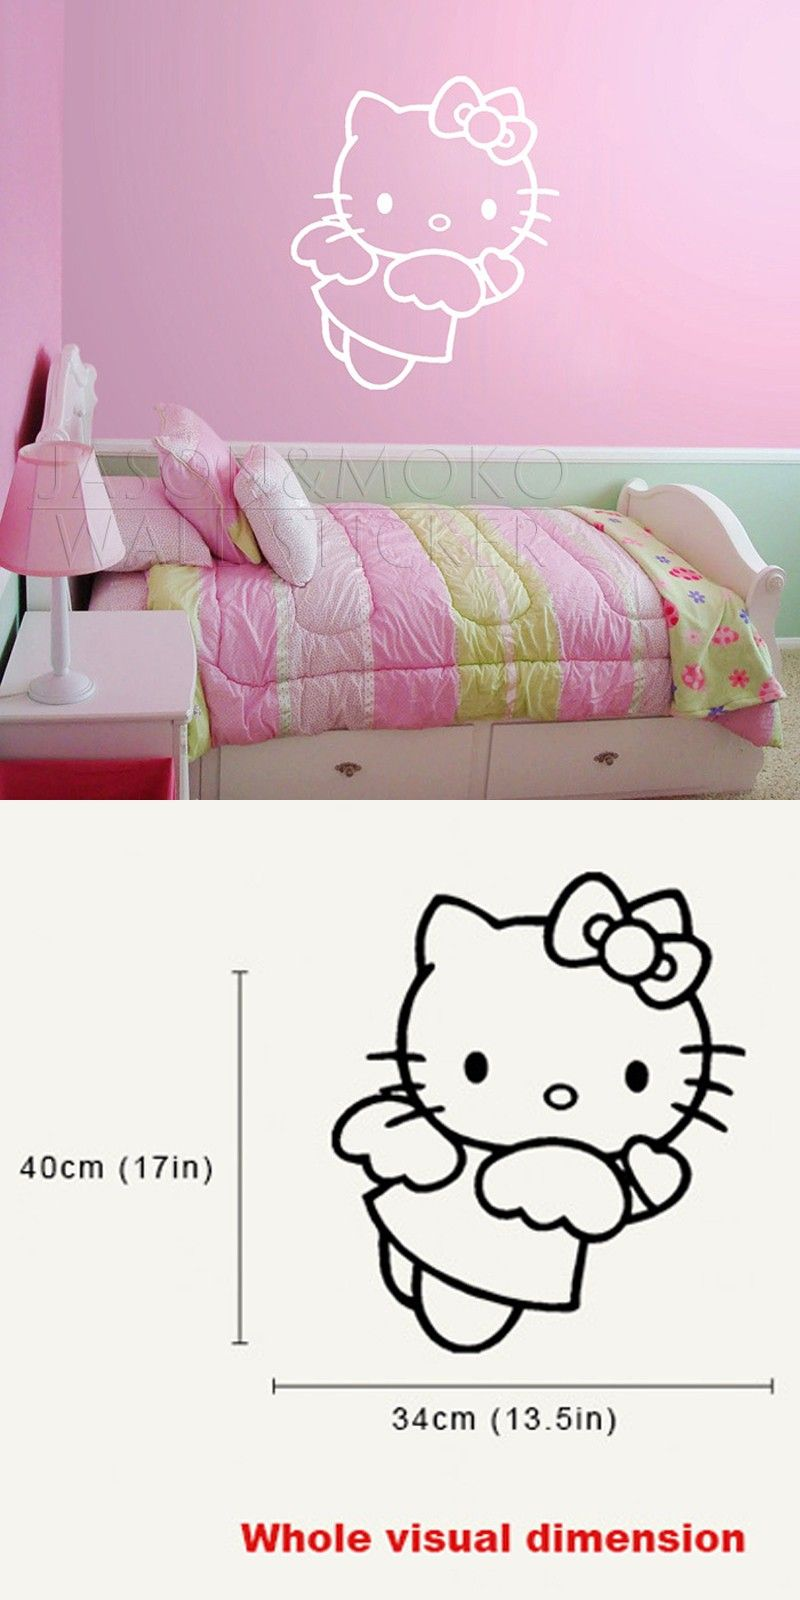 Best Wallpaper Hello Kitty Angel - 79356989fd0c1e7ddb74af8494f1fa36  You Should Have_249956.jpg